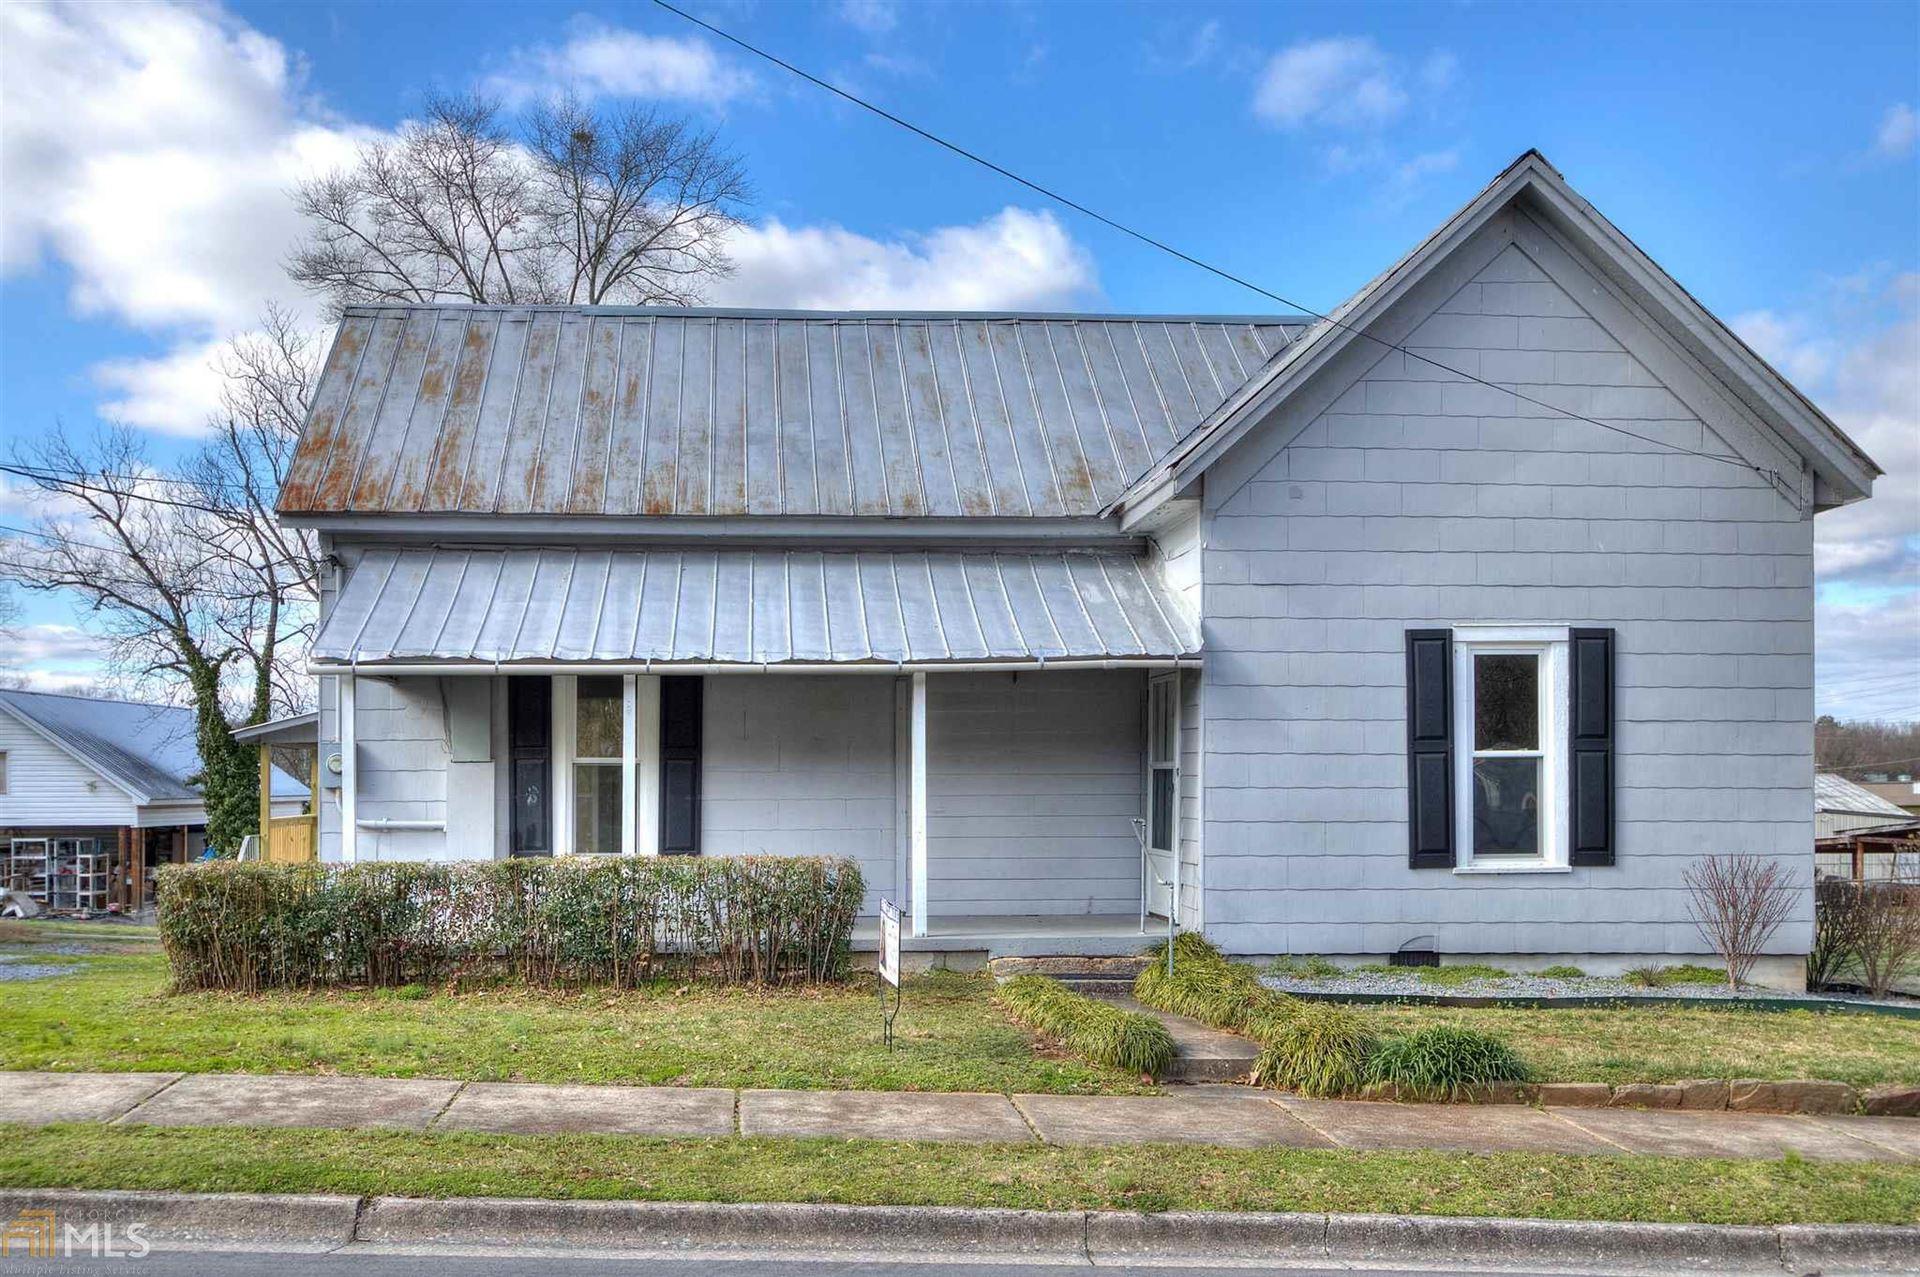 724 College St, Calhoun, GA 30701 - MLS#: 8727556